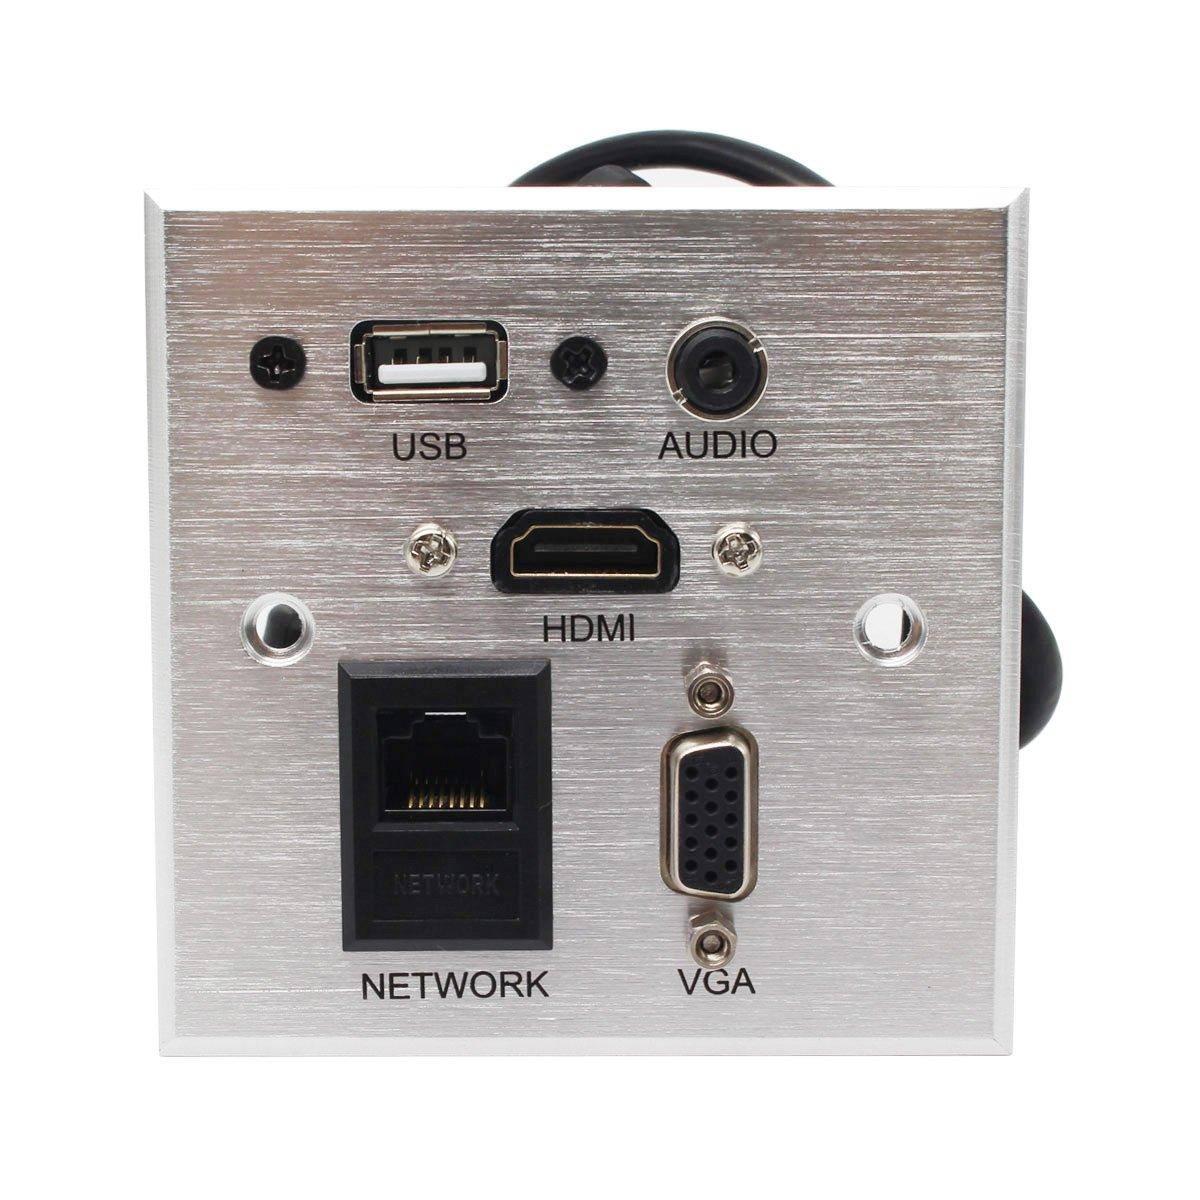 Multimedia Desk Socket Universal HDMI, USB, NETWORK, VGA, Auido information Outlet Box High-grade Wall Socket Panel